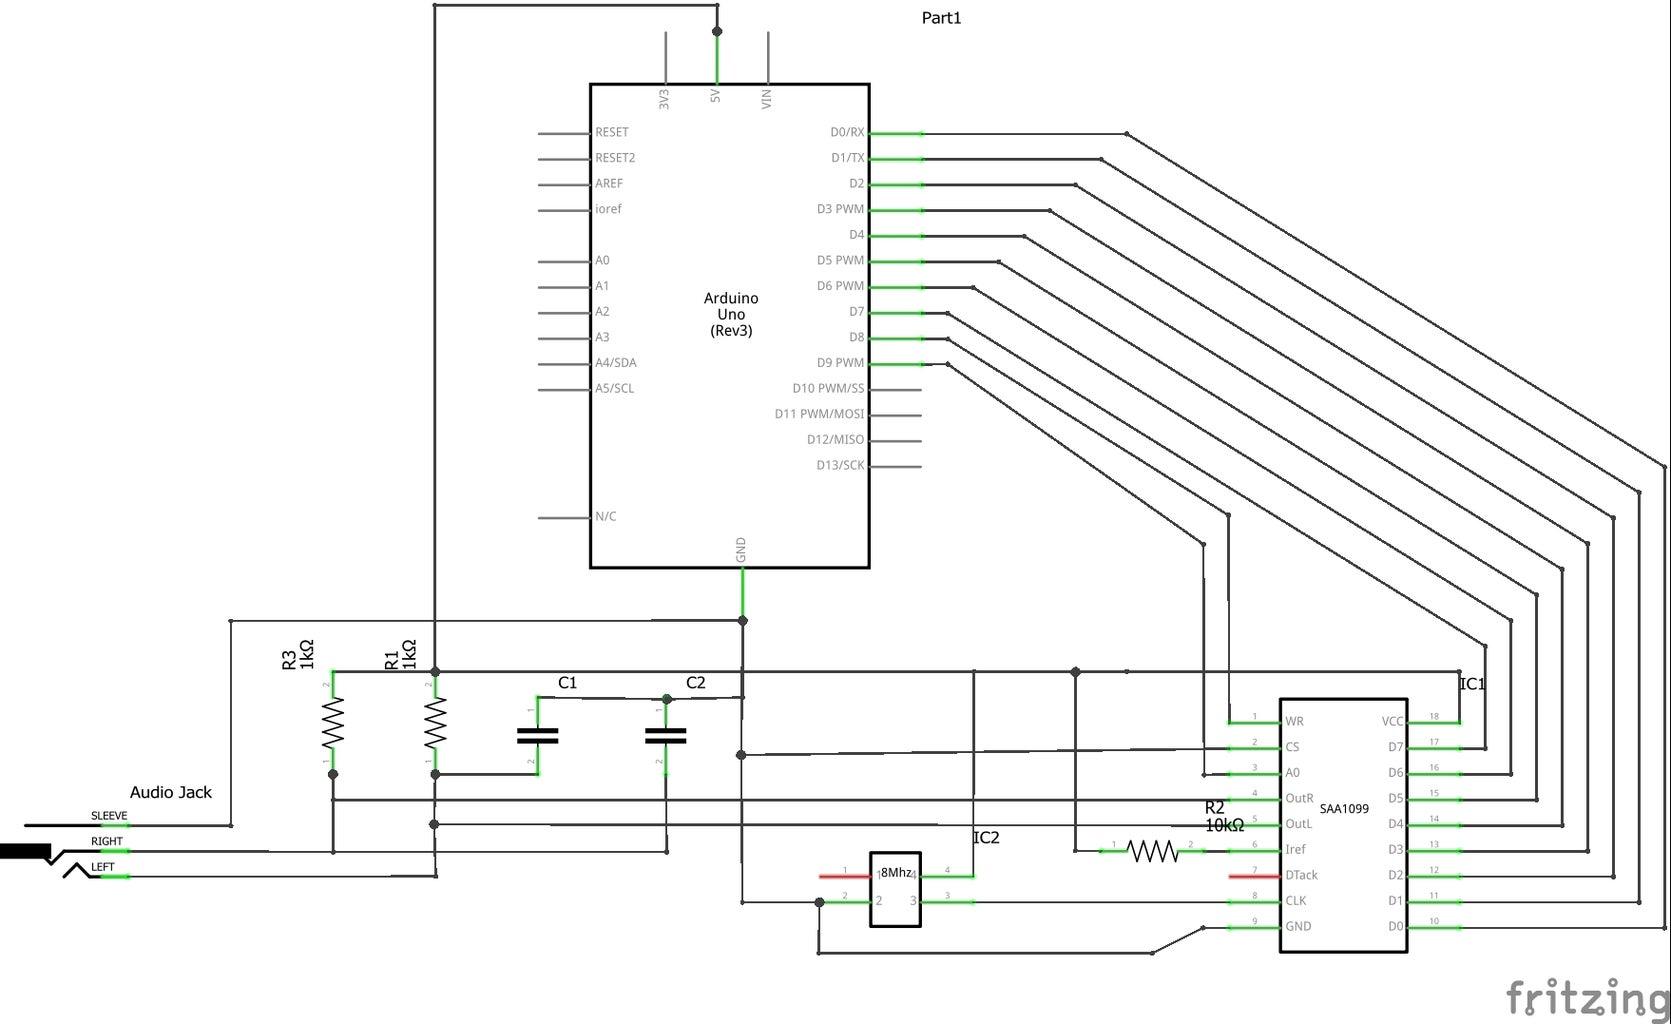 Wiring - SAA1099